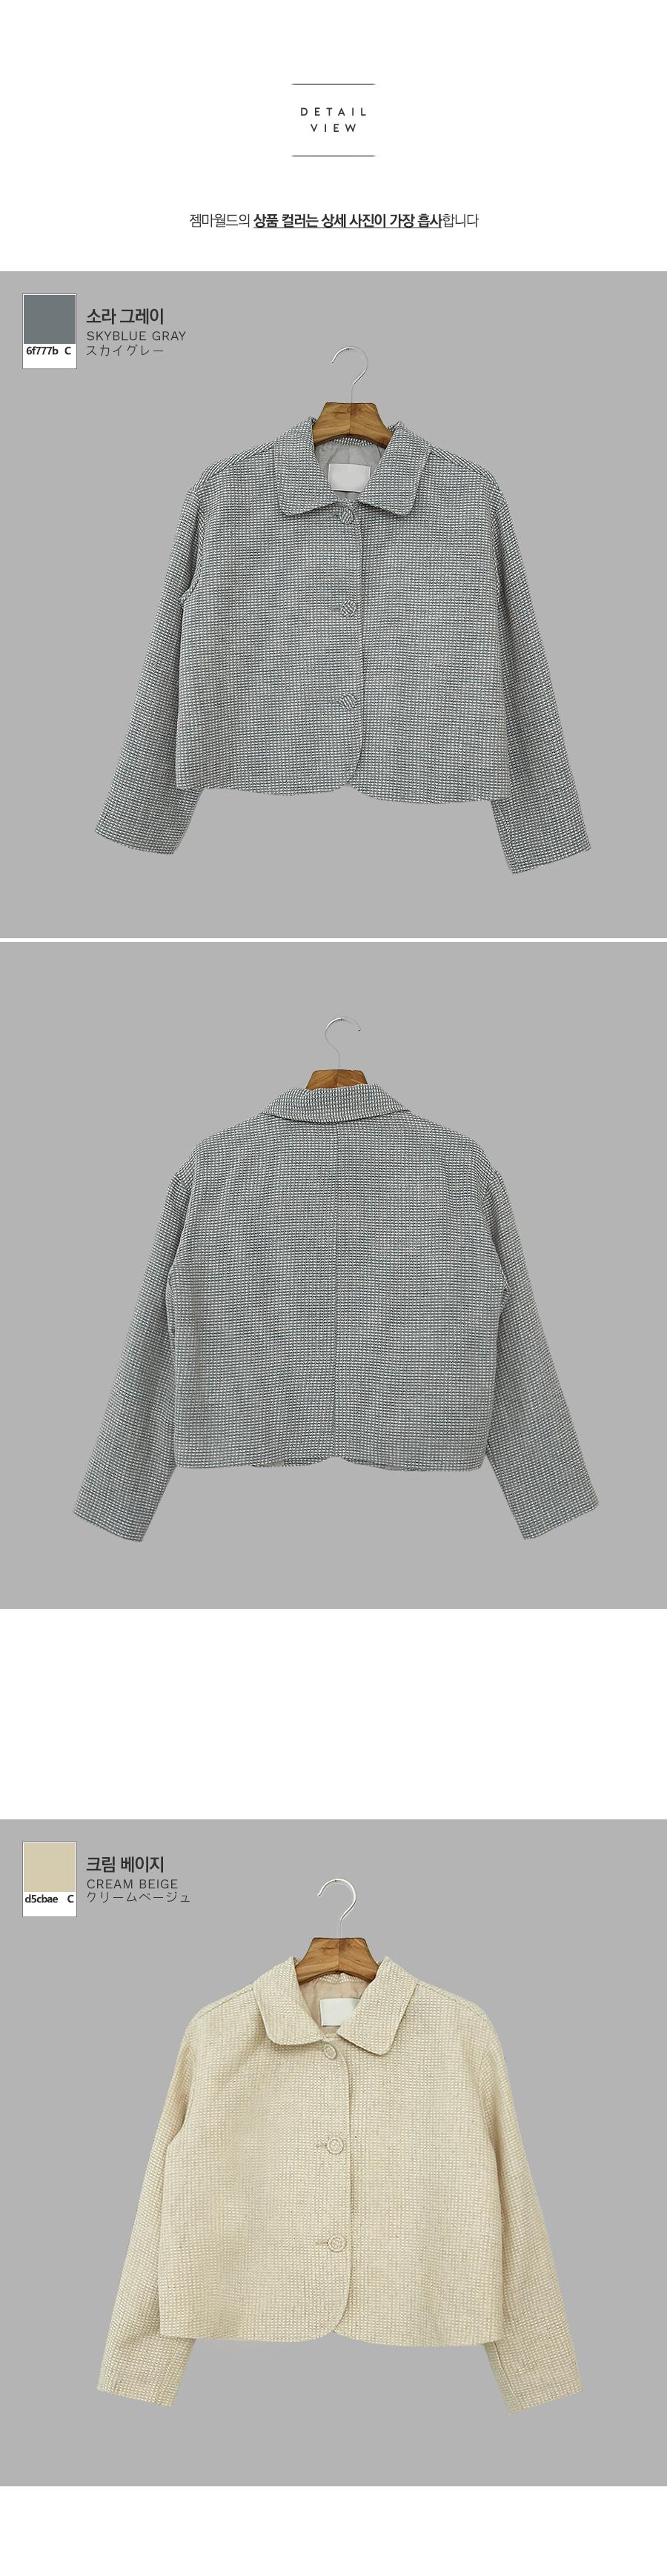 Knots tweed linen jacket